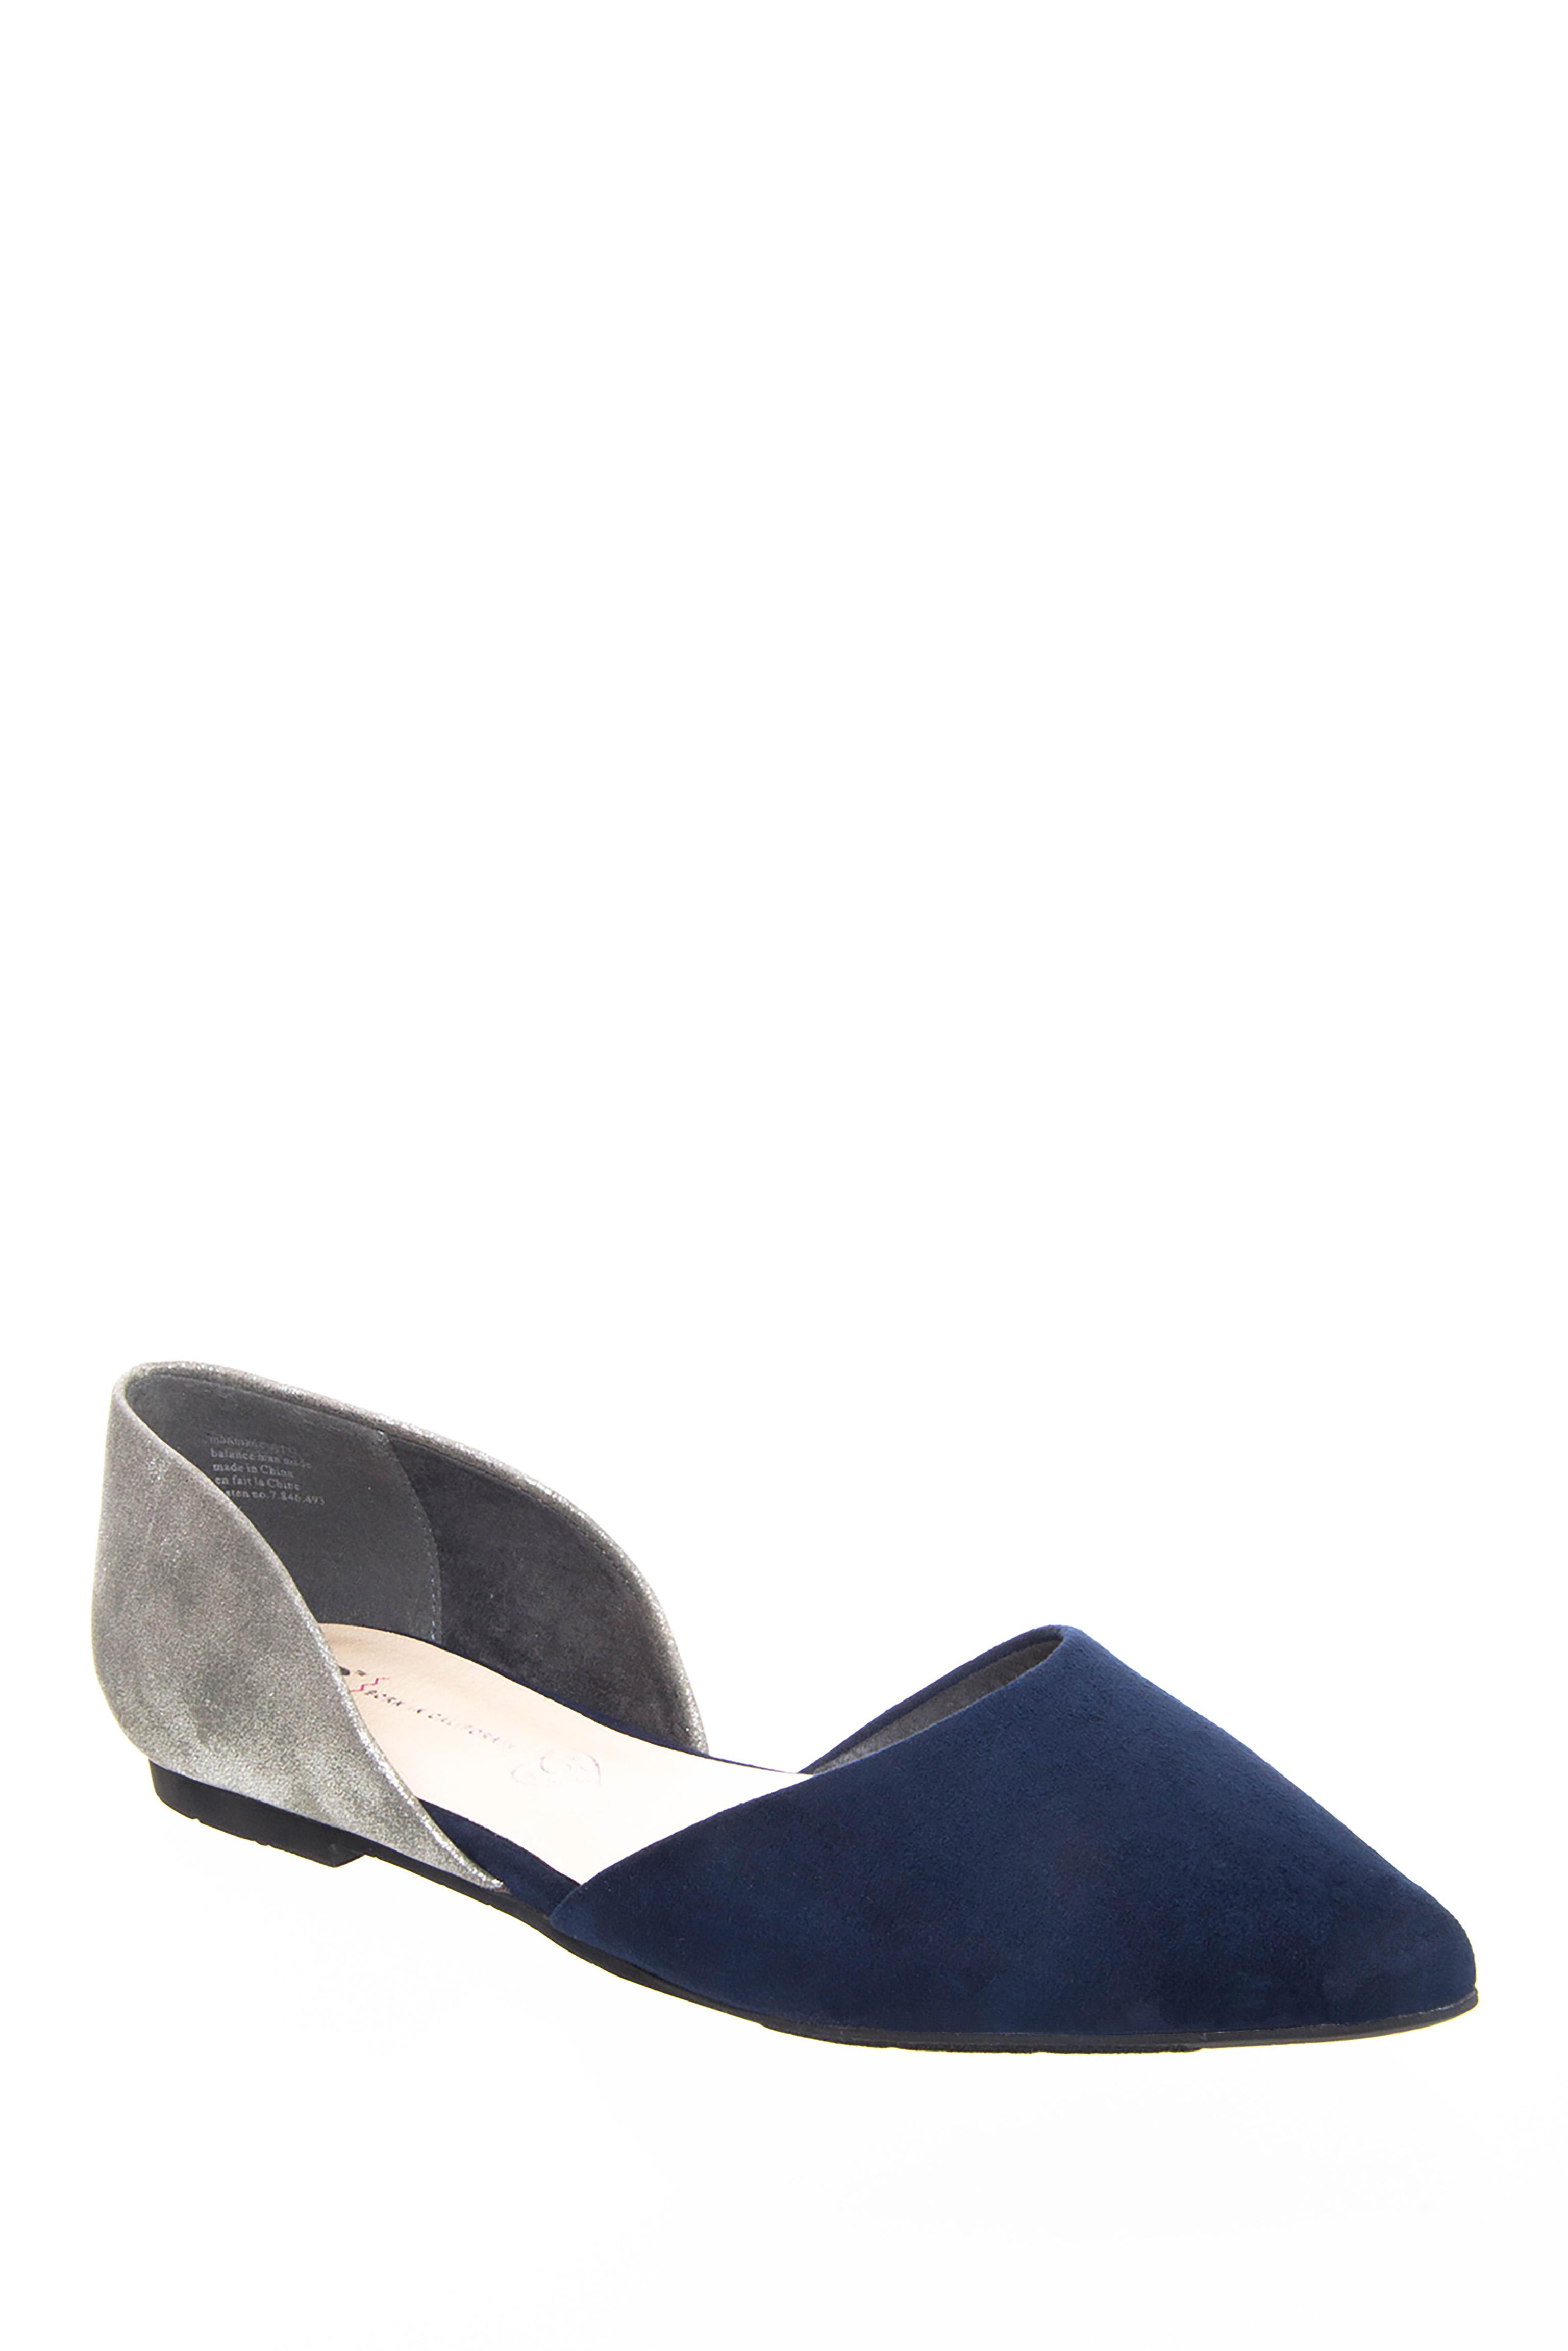 BC Footwear Society d'Orsay Flats - Navy / Pewter